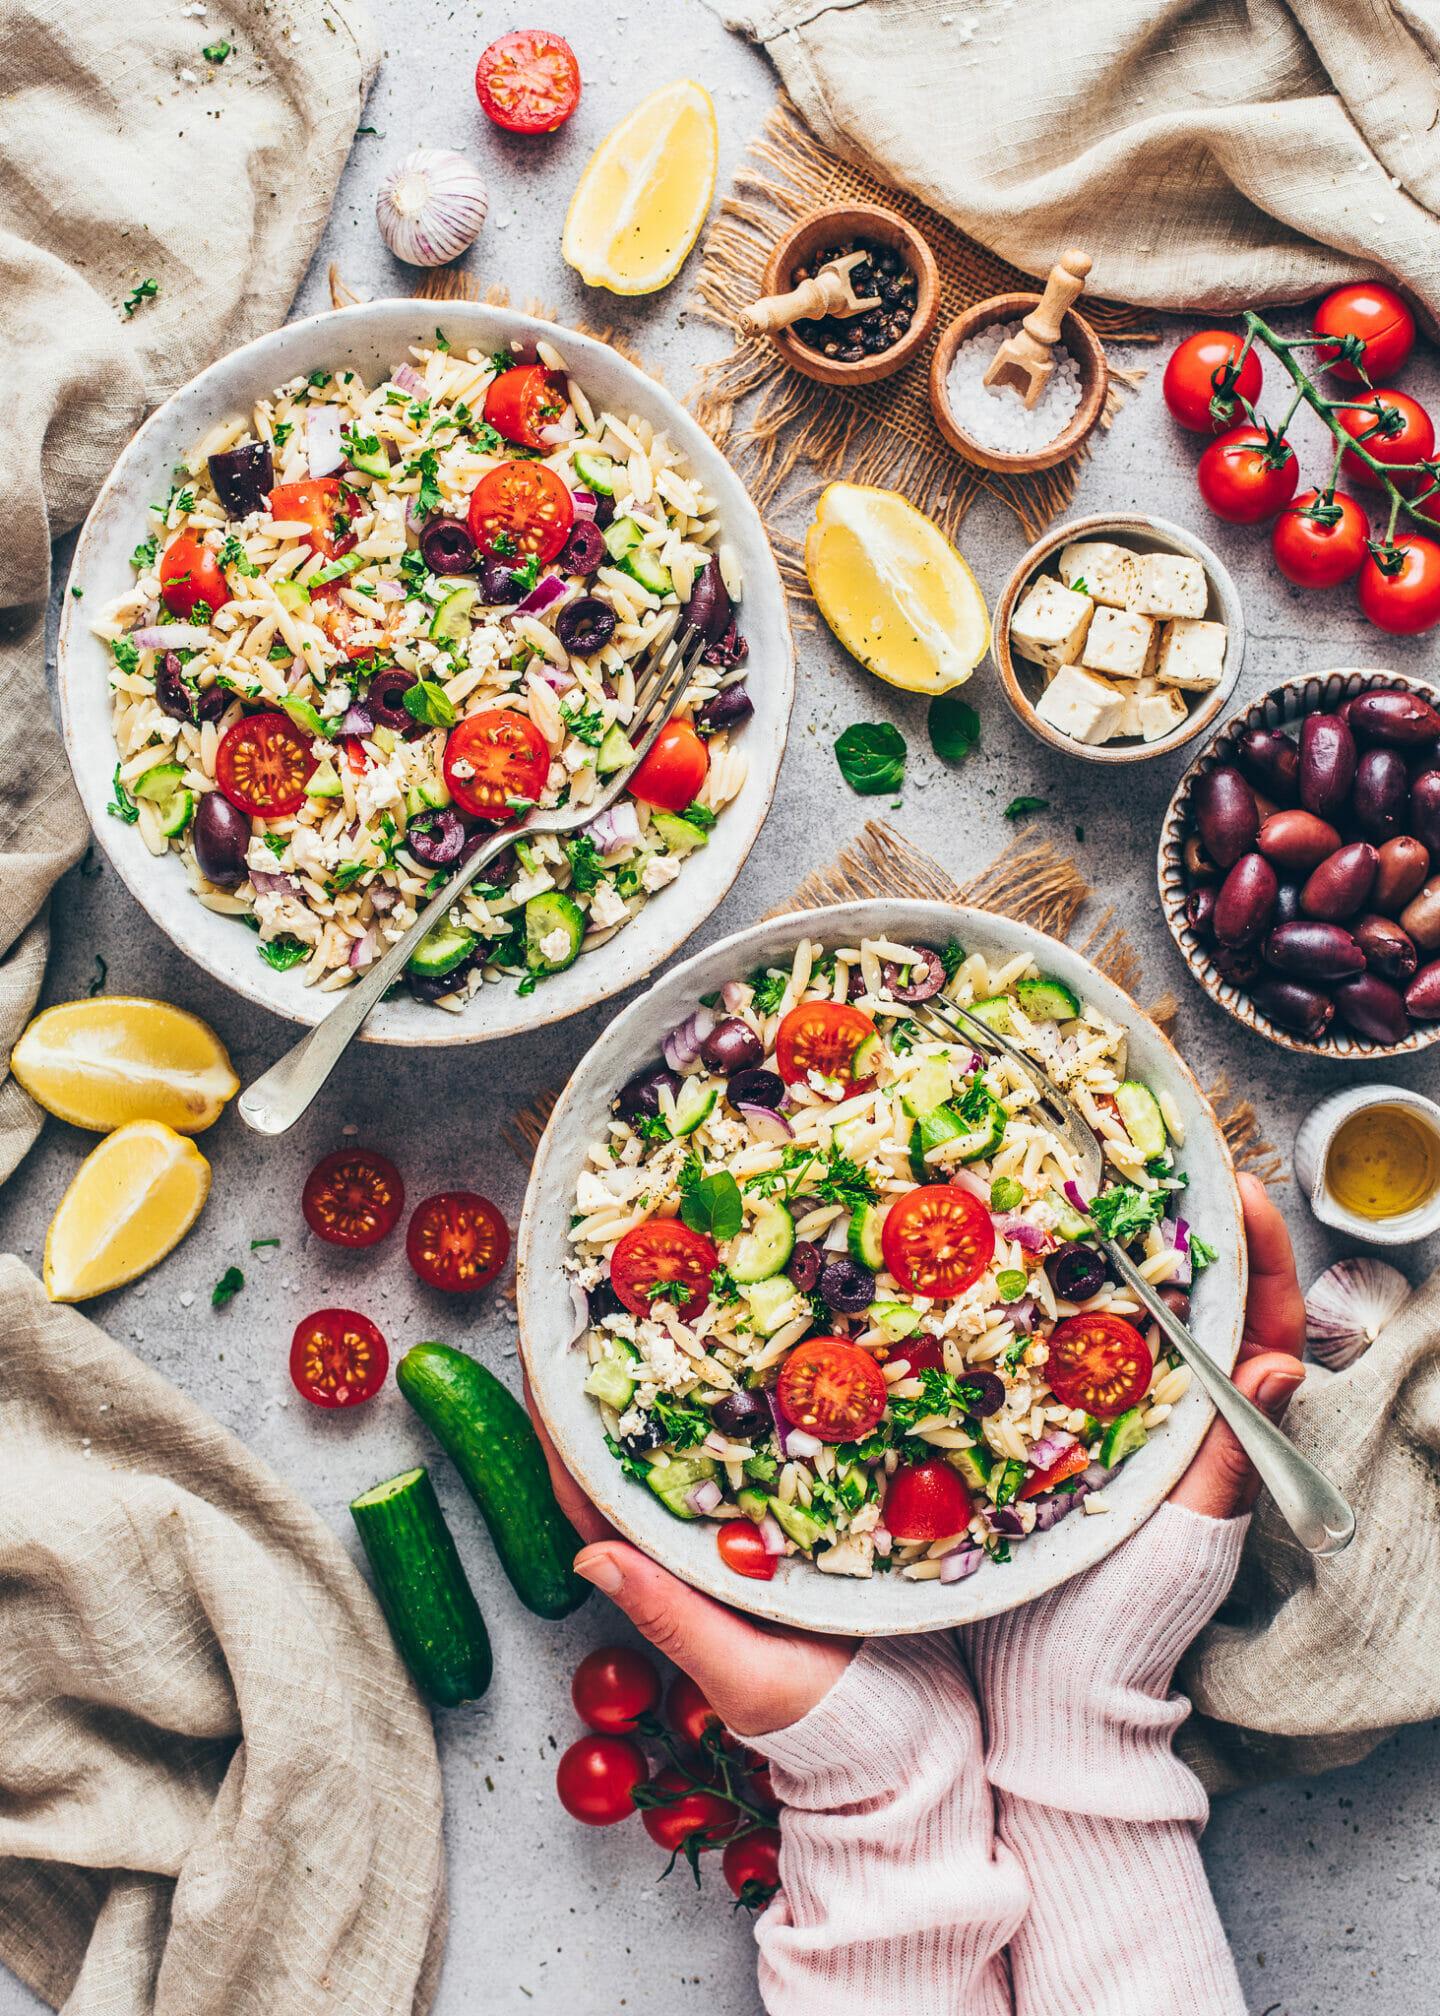 Greek Orzo Pasta Salad With Vegan Feta Bianca Zapatka Recipes